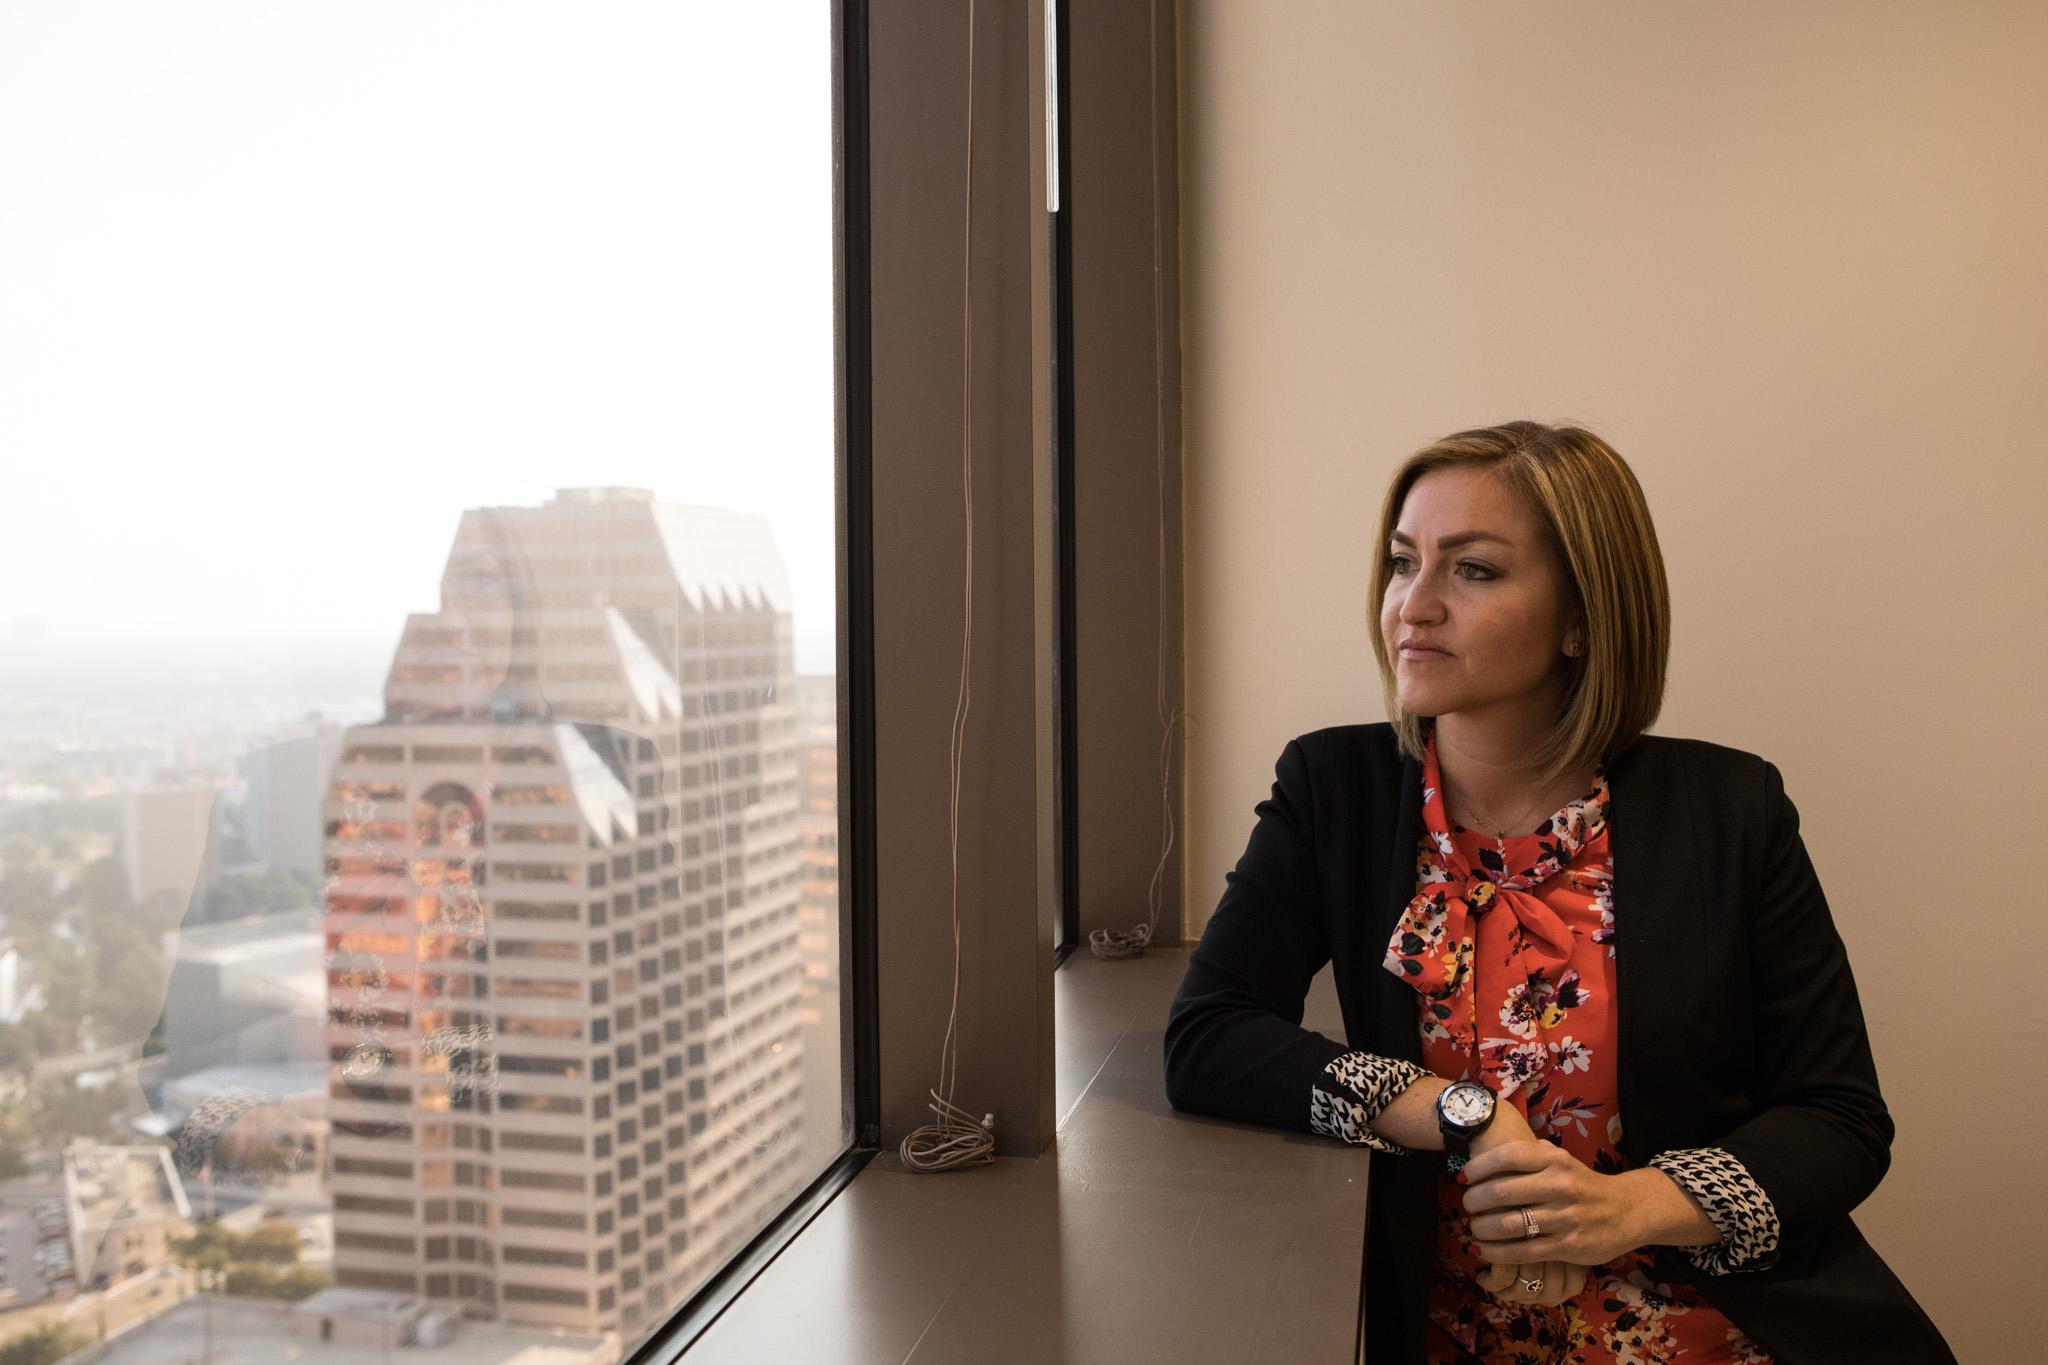 San Antonio EDF President & CEO Jenna Saucedo-Herrera looks out the window of the new San Antonio Economic Development Foundation in the Weston Centre.